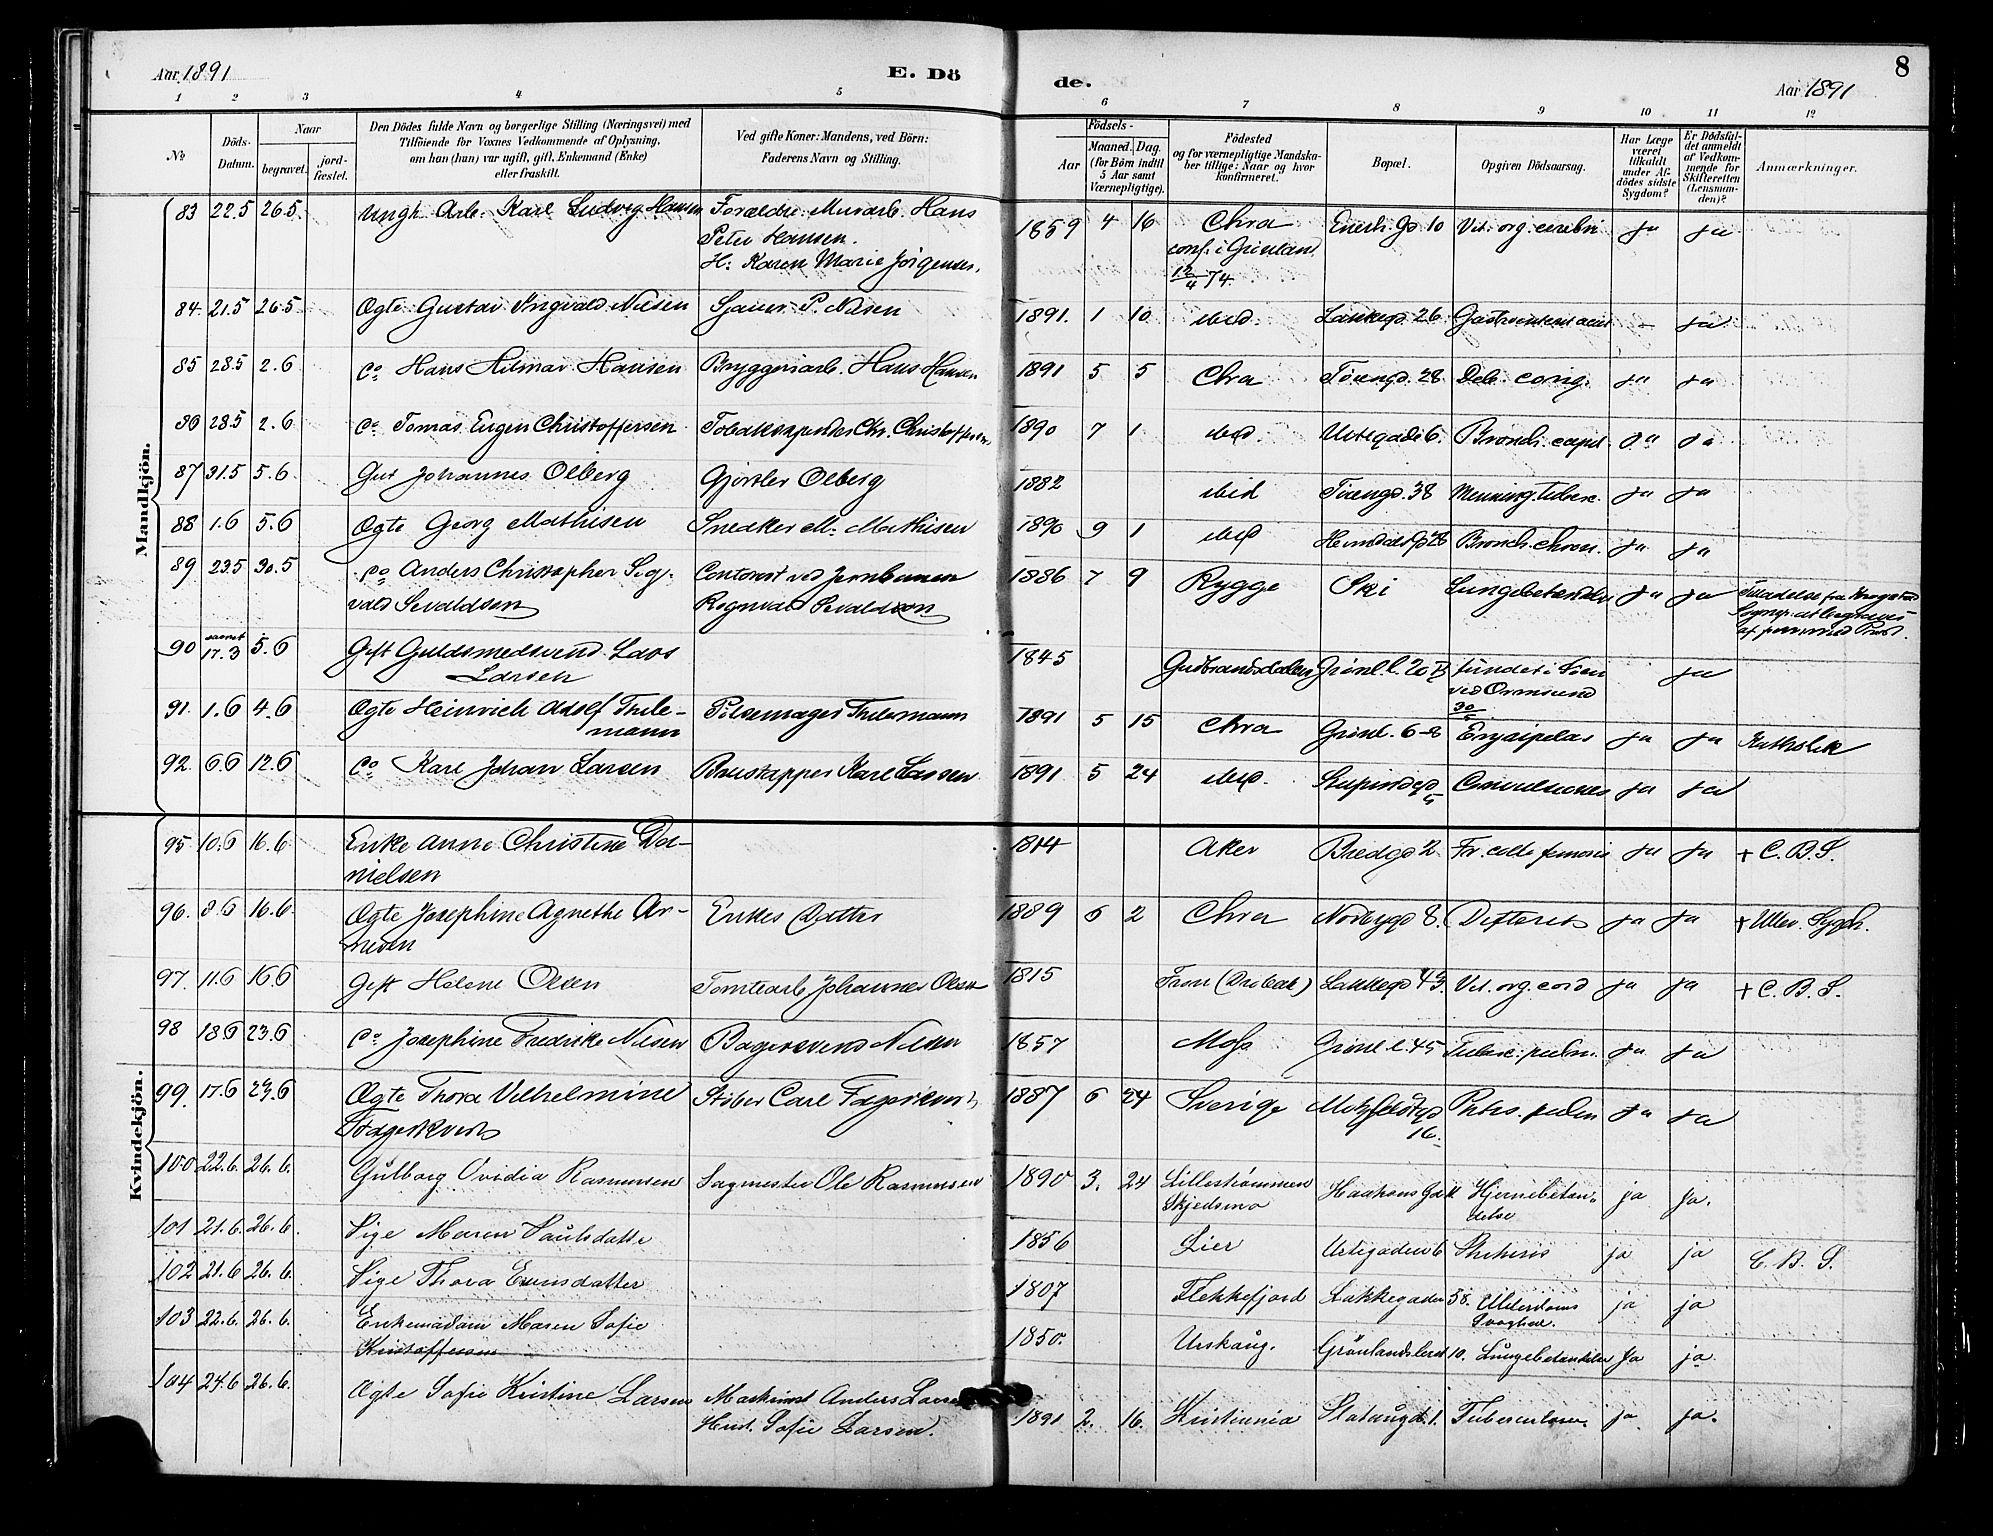 SAO, Grønland prestekontor Kirkebøker, F/Fa/L0010: Ministerialbok nr. 10, 1891-1898, s. 8